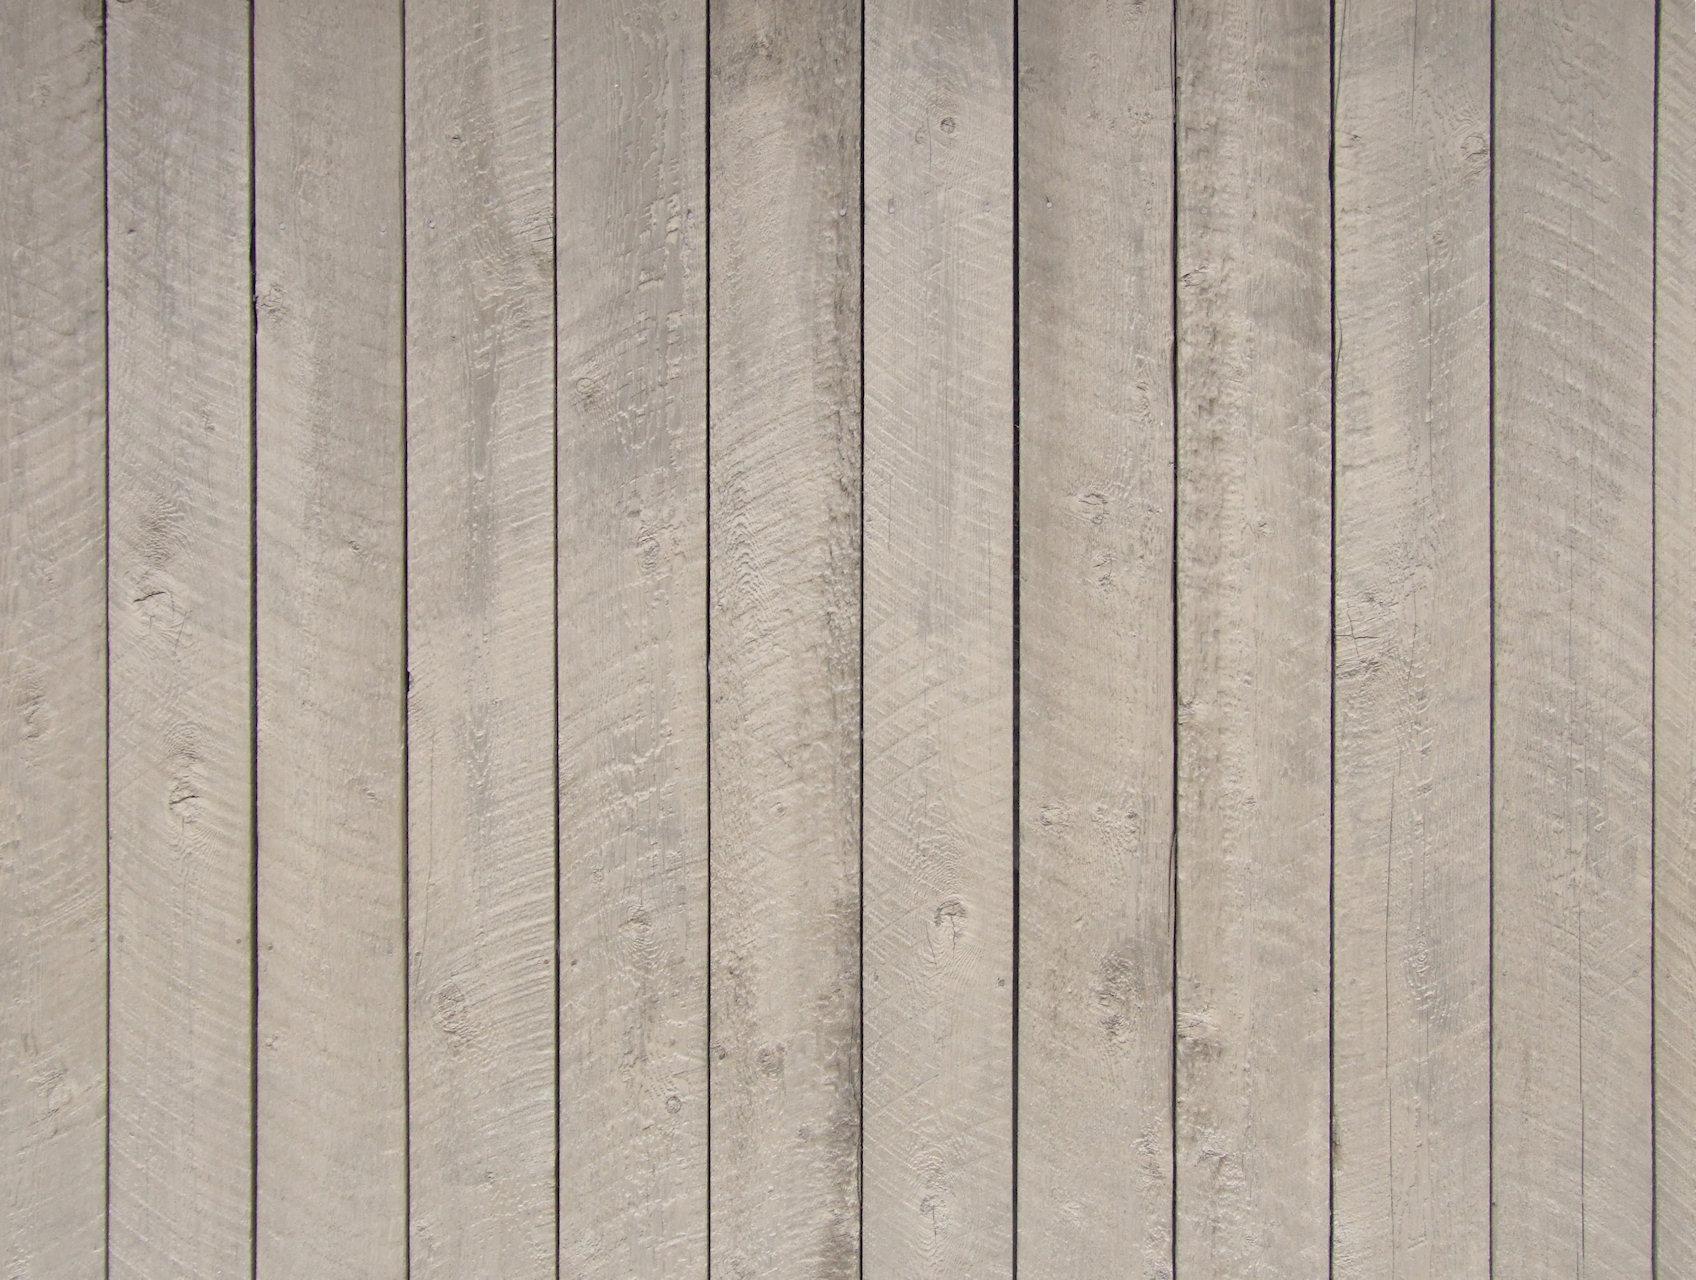 48+] Wallpaper for Paneled Walls on WallpaperSafari